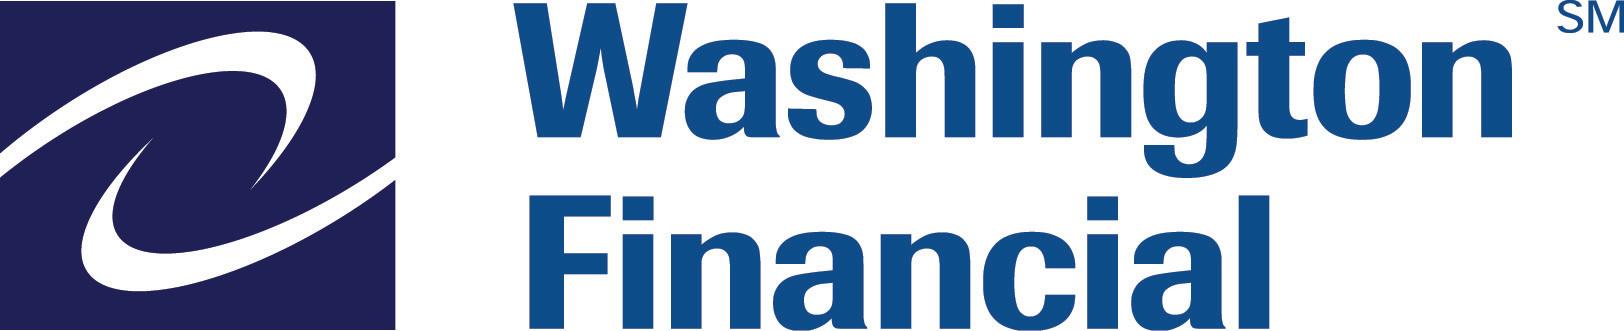 Washington Financial